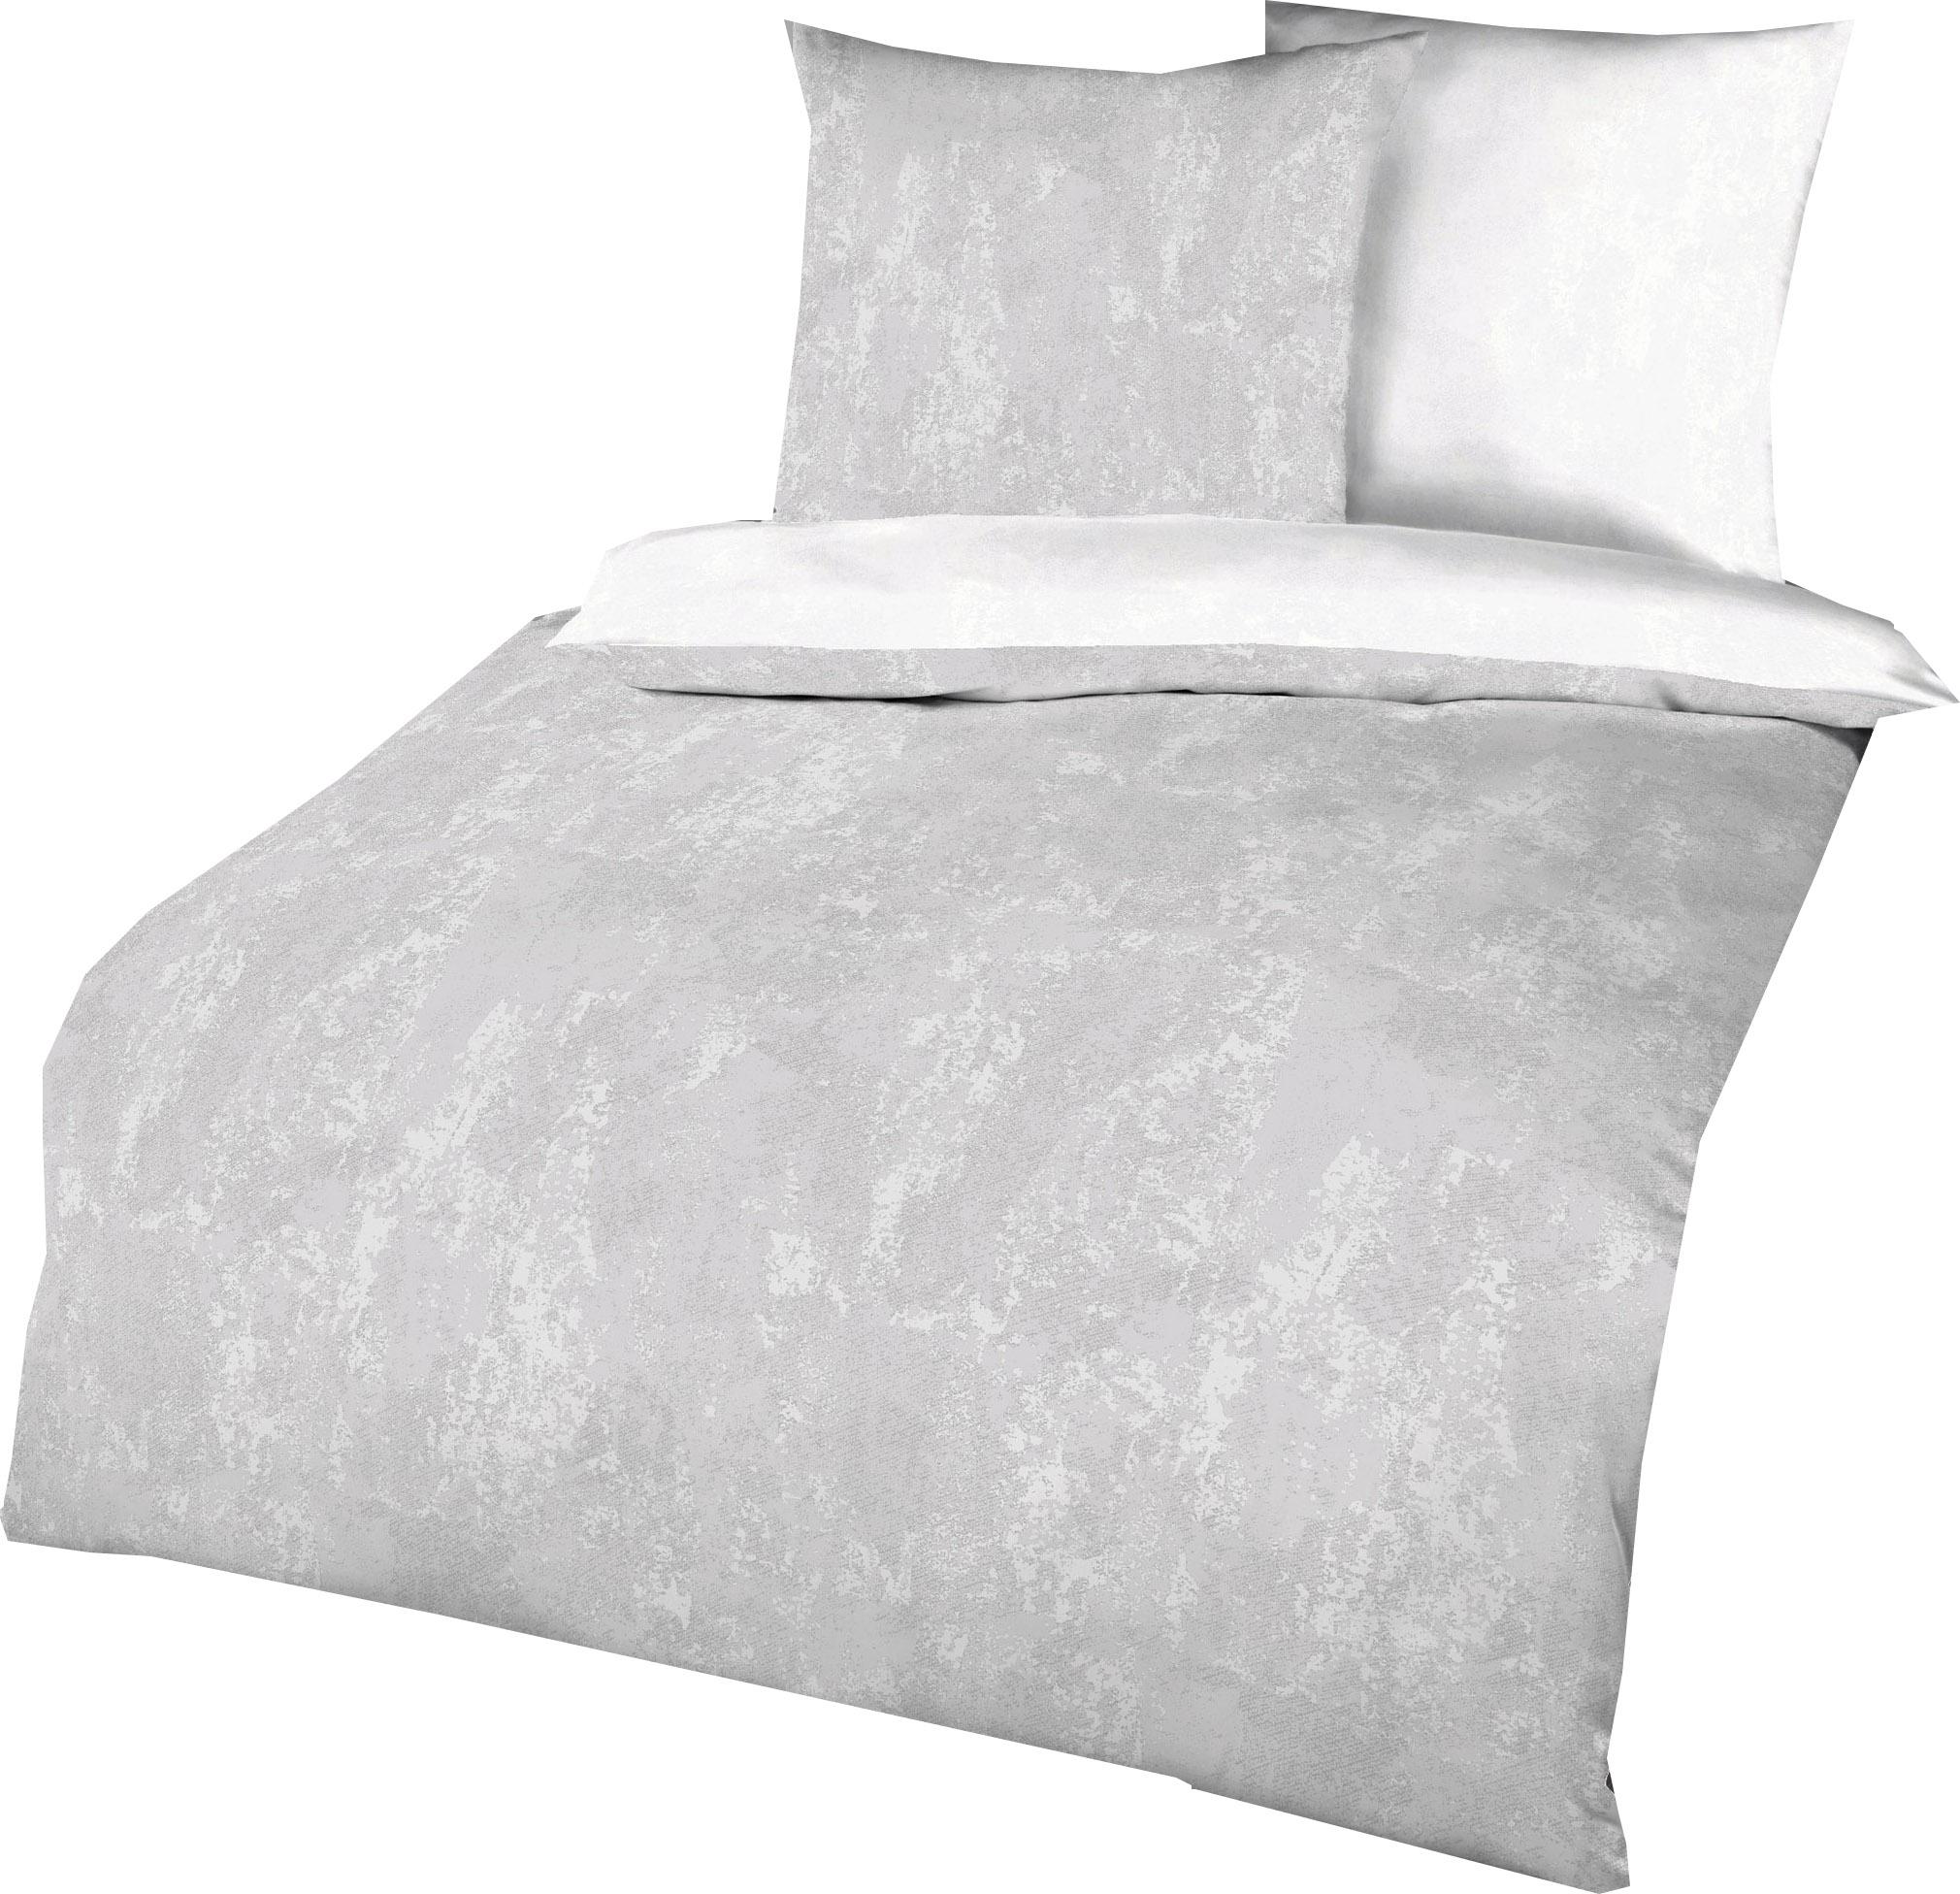 Kaeppel Mako Satin Bettwäsche Essential Texture D Größe 135x200